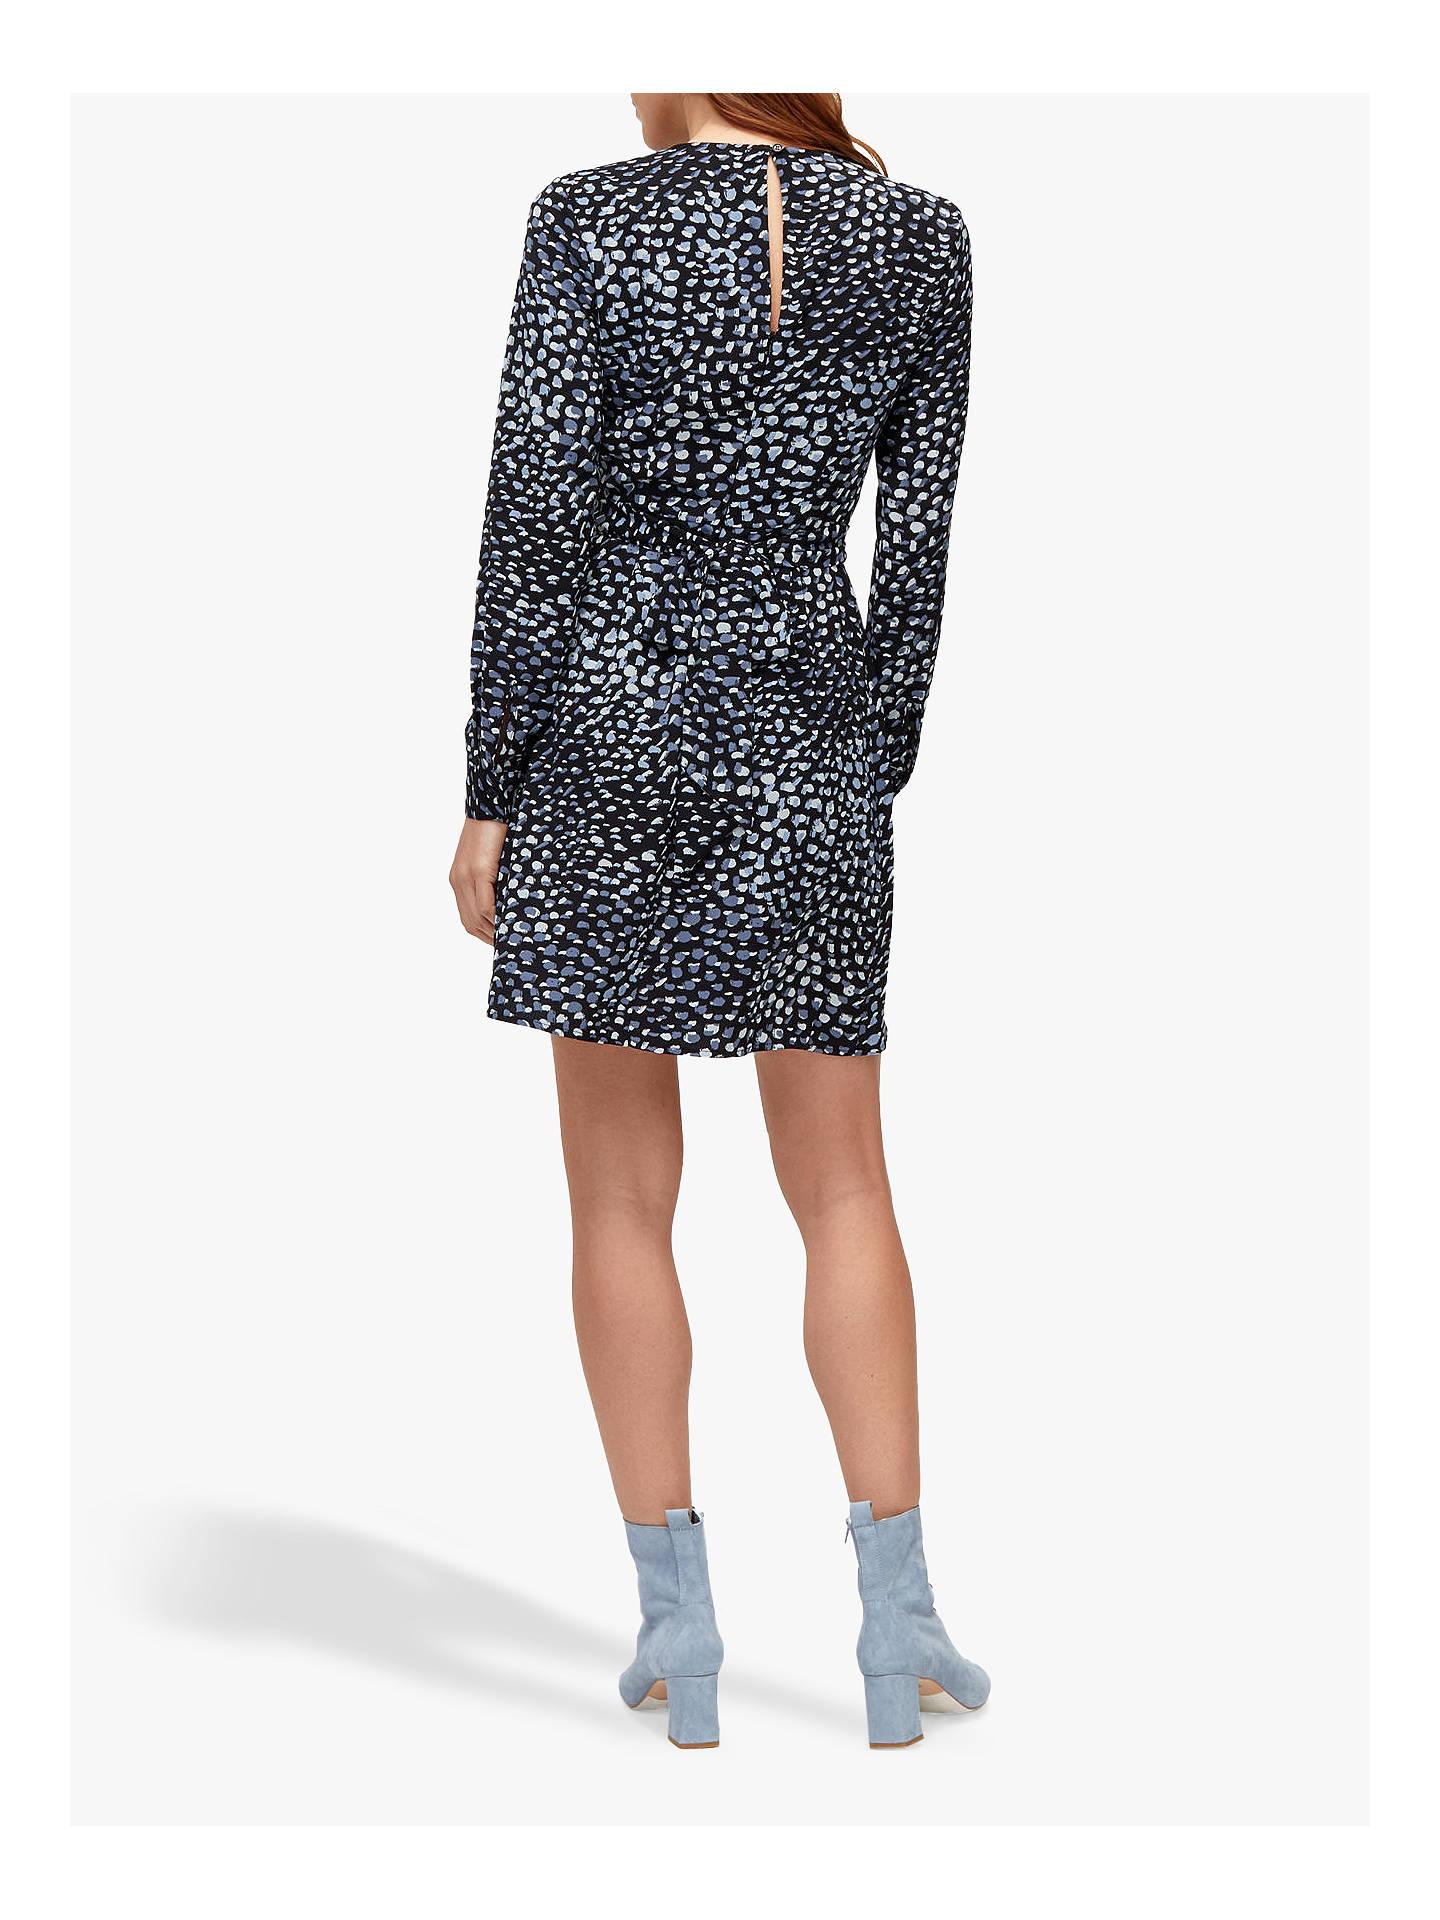 1169b5ecb5 ... BuyWarehouse Brushed Animal Print Dress